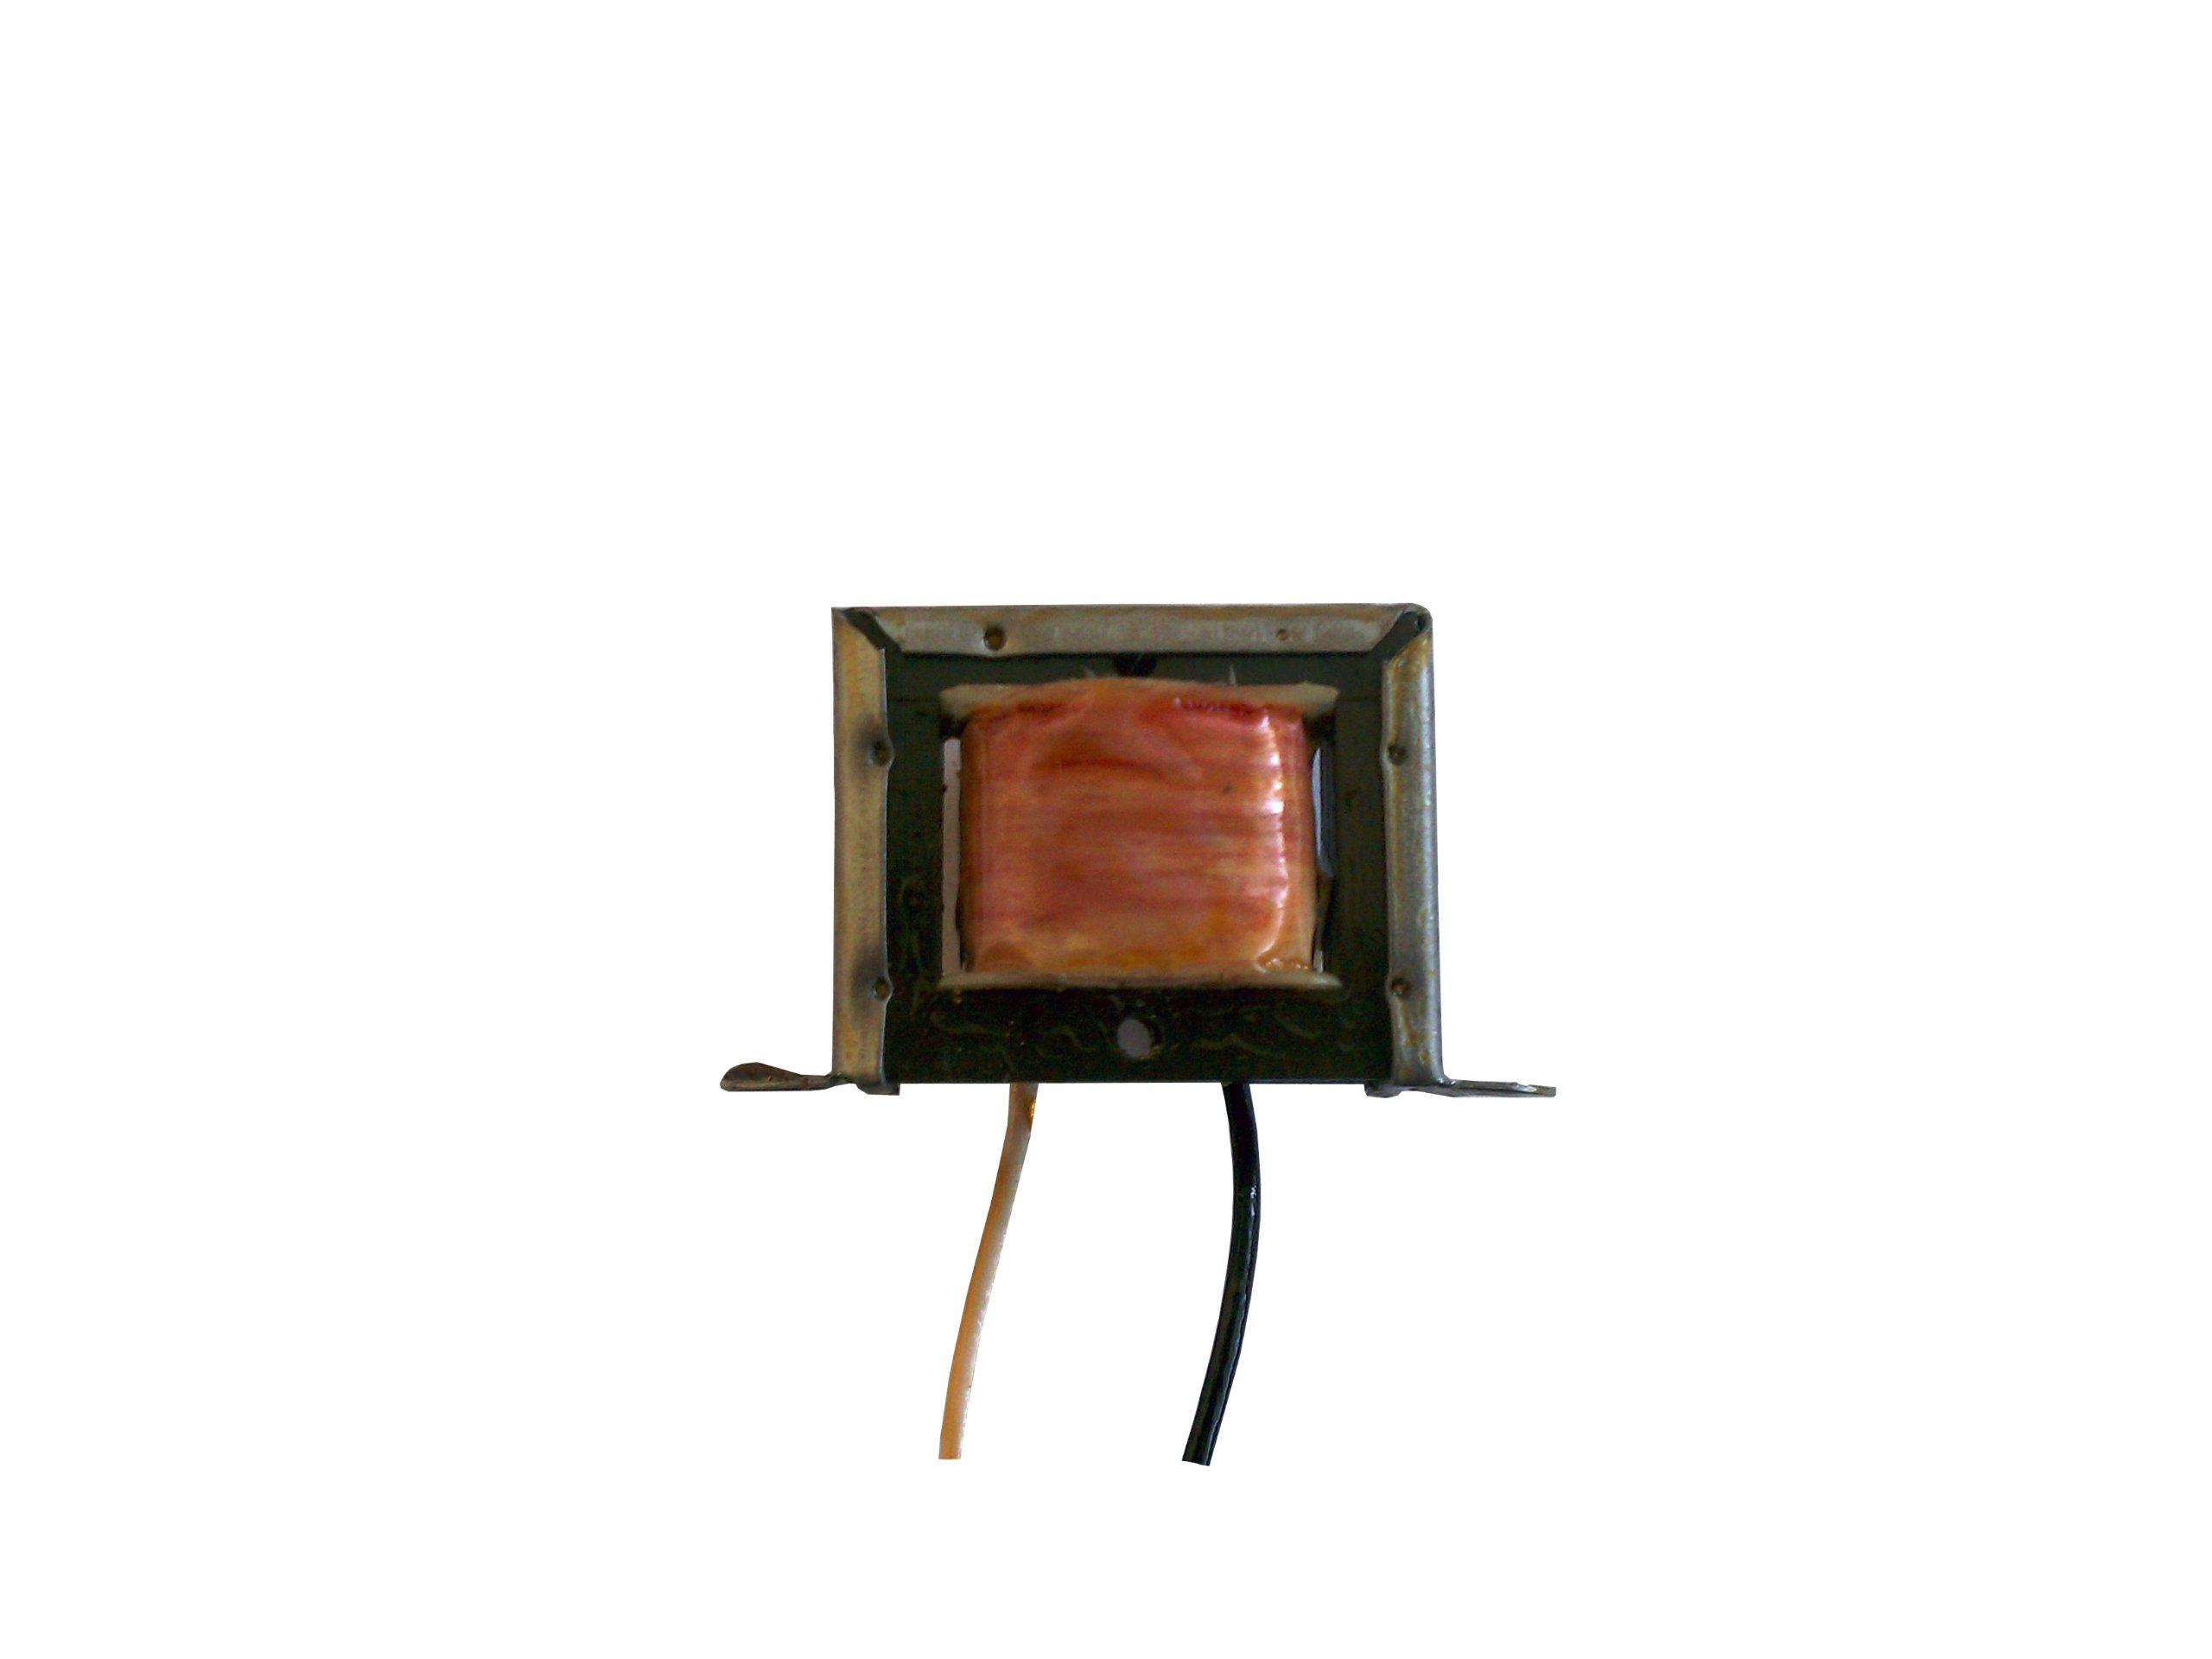 120-Volt 1-Lamp F8T5 Normal Power Factor Magnetic Ballast-Radionic Hi Tech Inc.